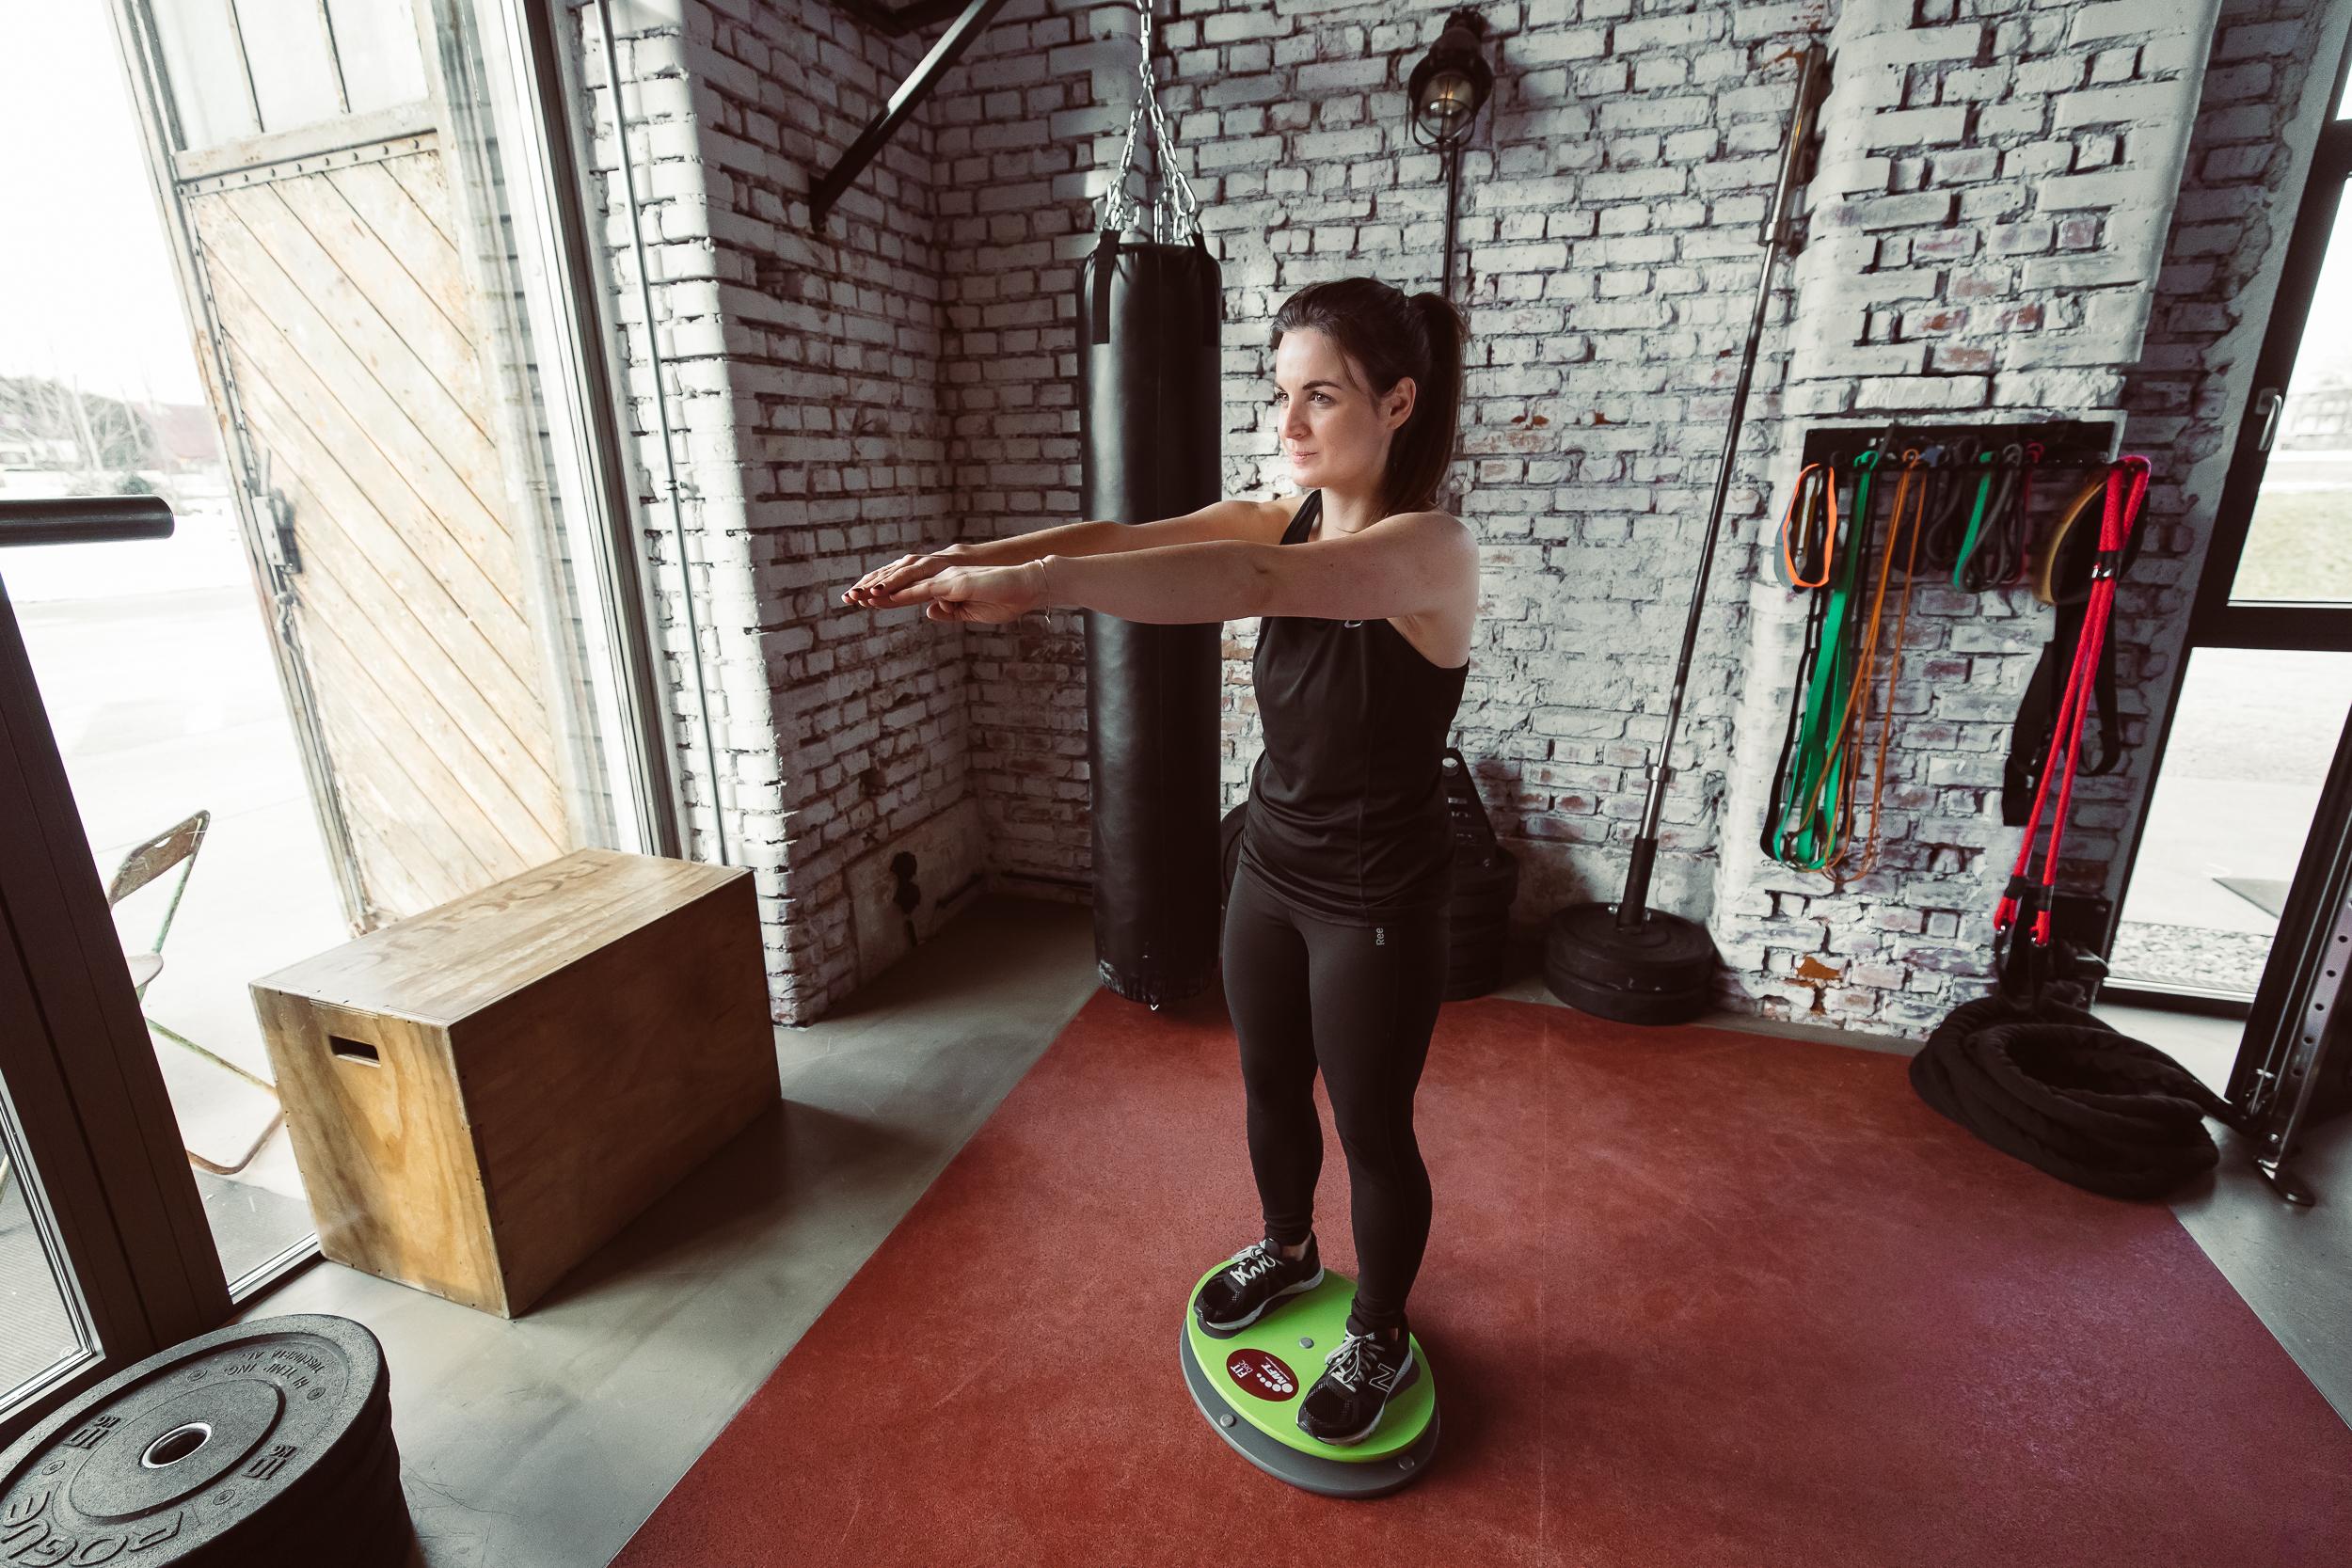 mft-sportssupport-training-0074